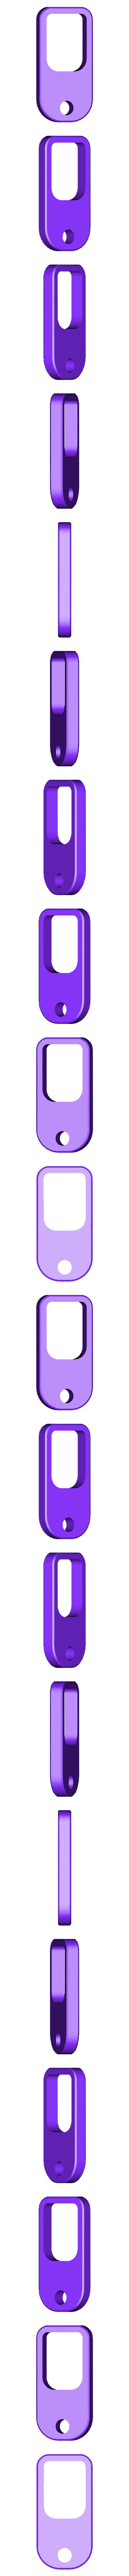 klip.stl Download free STL file key hanger • 3D print template, zibi36